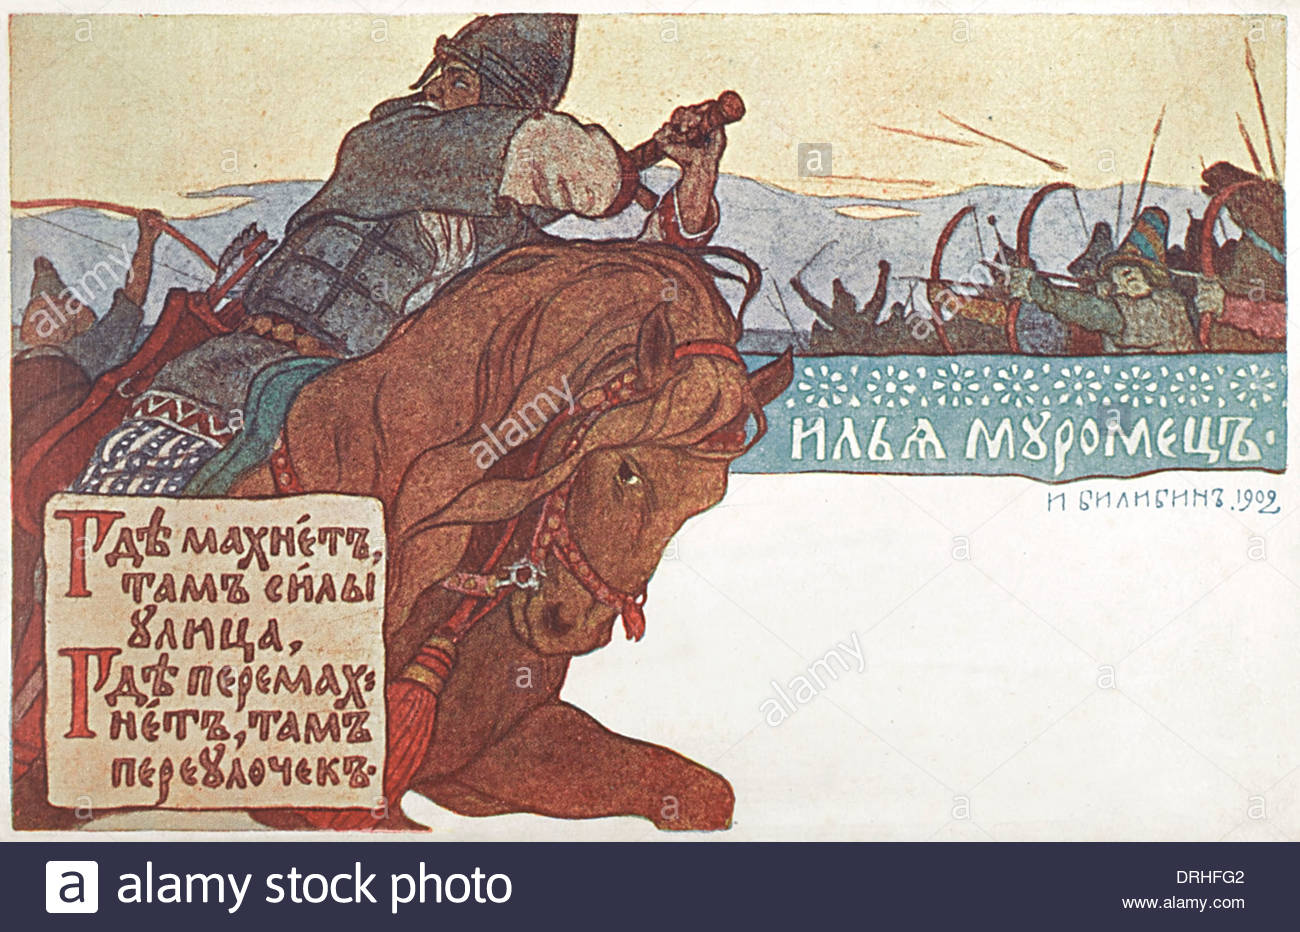 ilya-muromets-elijah-of-murom-on-horseback-DRHFG2